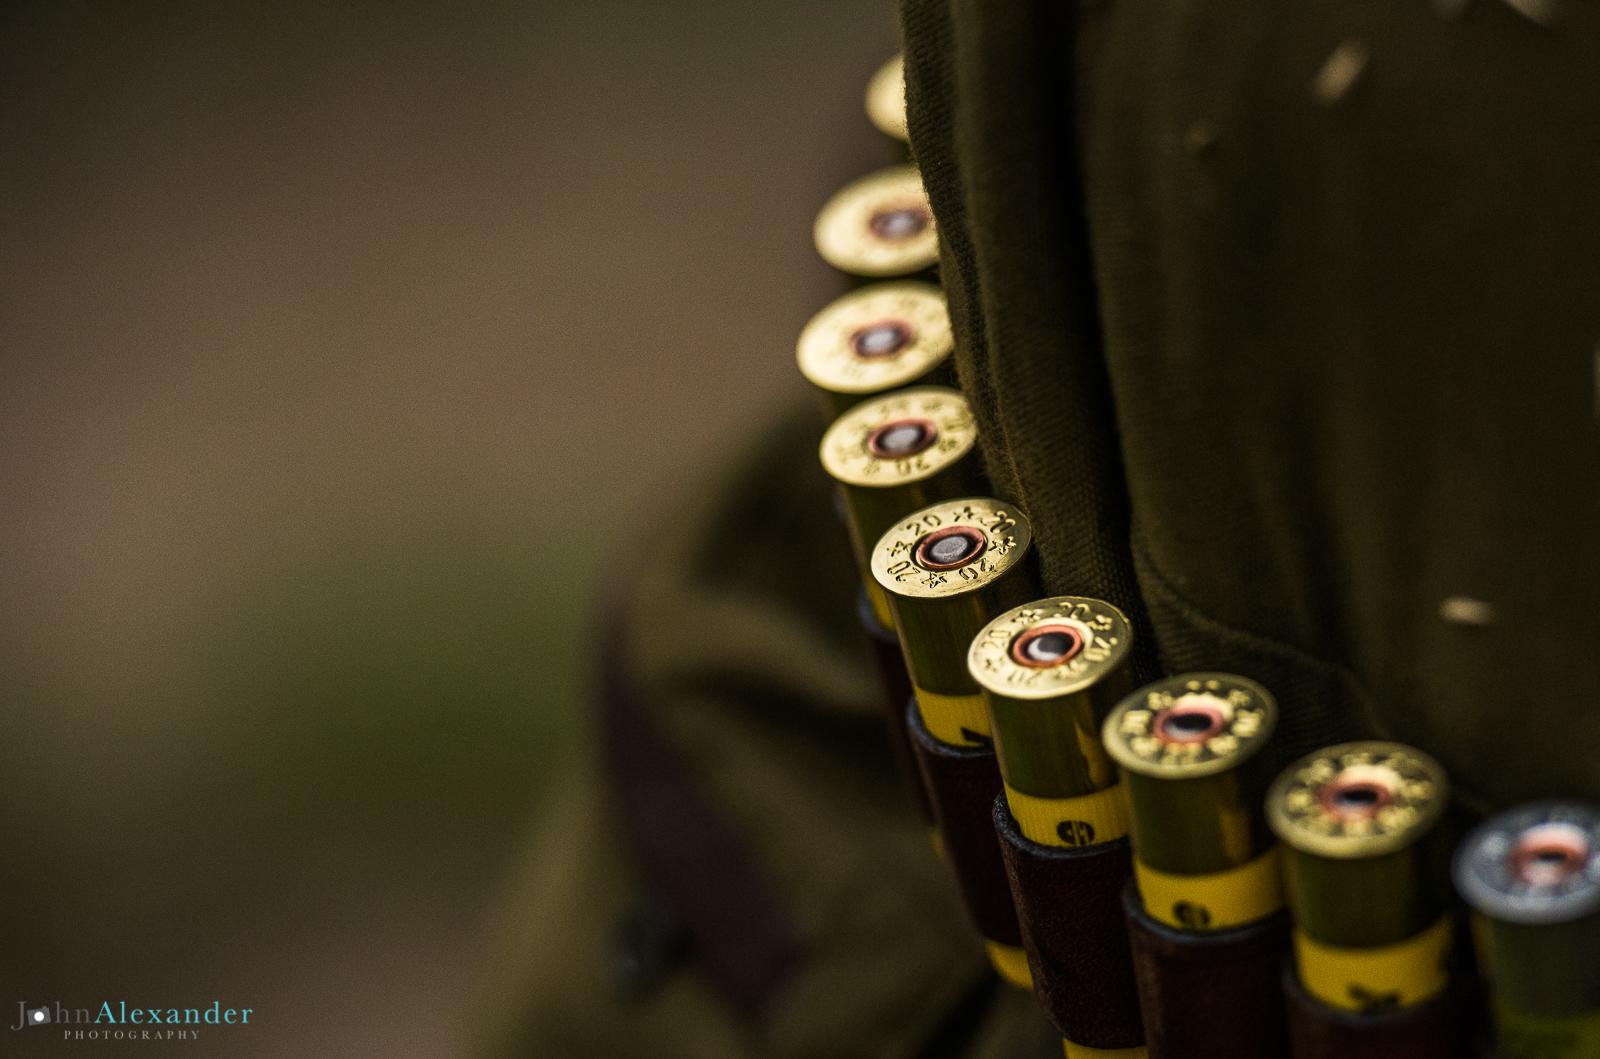 shotgun cartridge belt on a shoot in Wales, UK